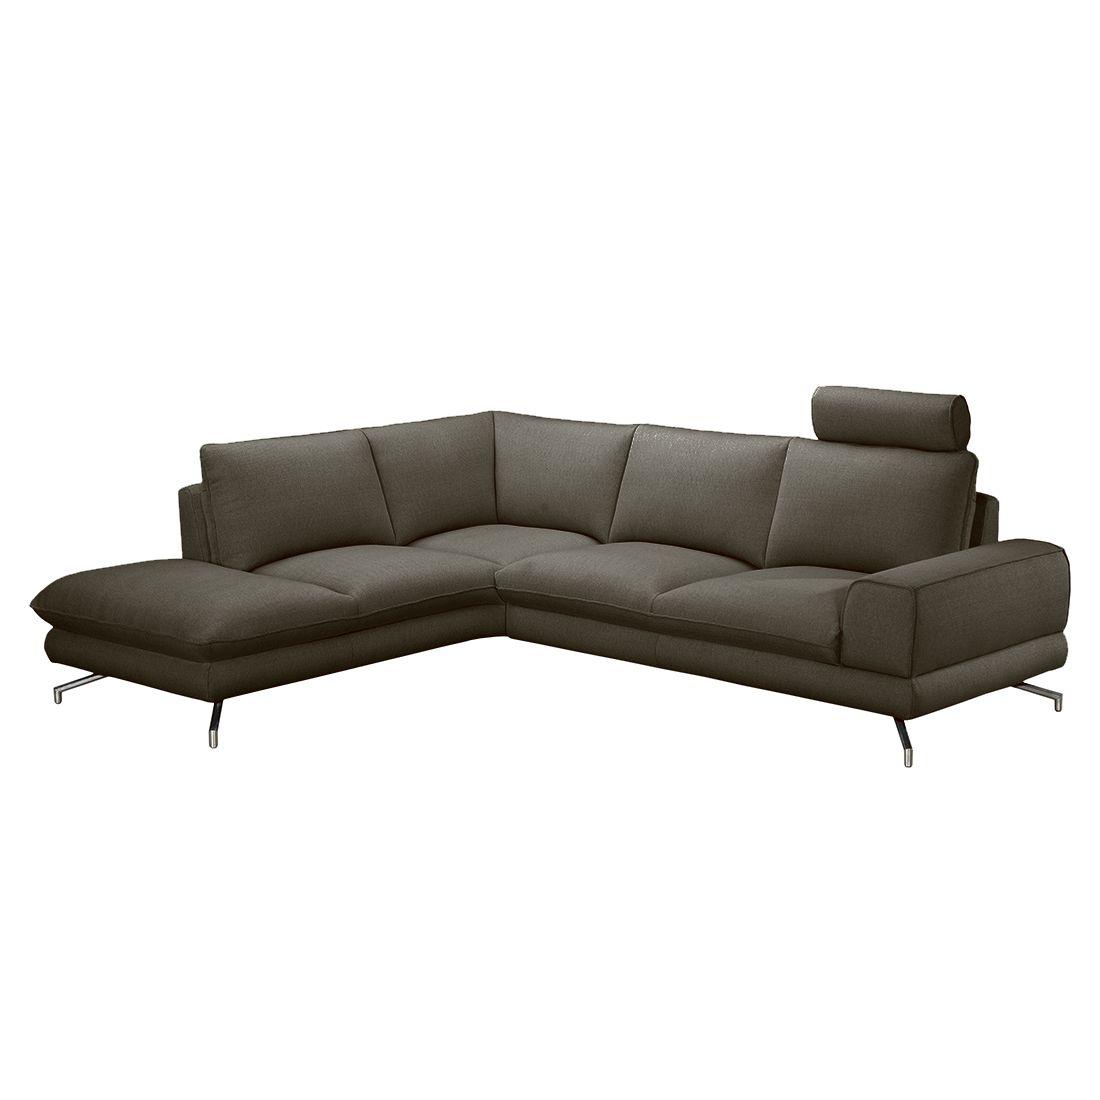 ecksofa lennard strukturstoff grau braun ottomane davorstehend links moebel. Black Bedroom Furniture Sets. Home Design Ideas